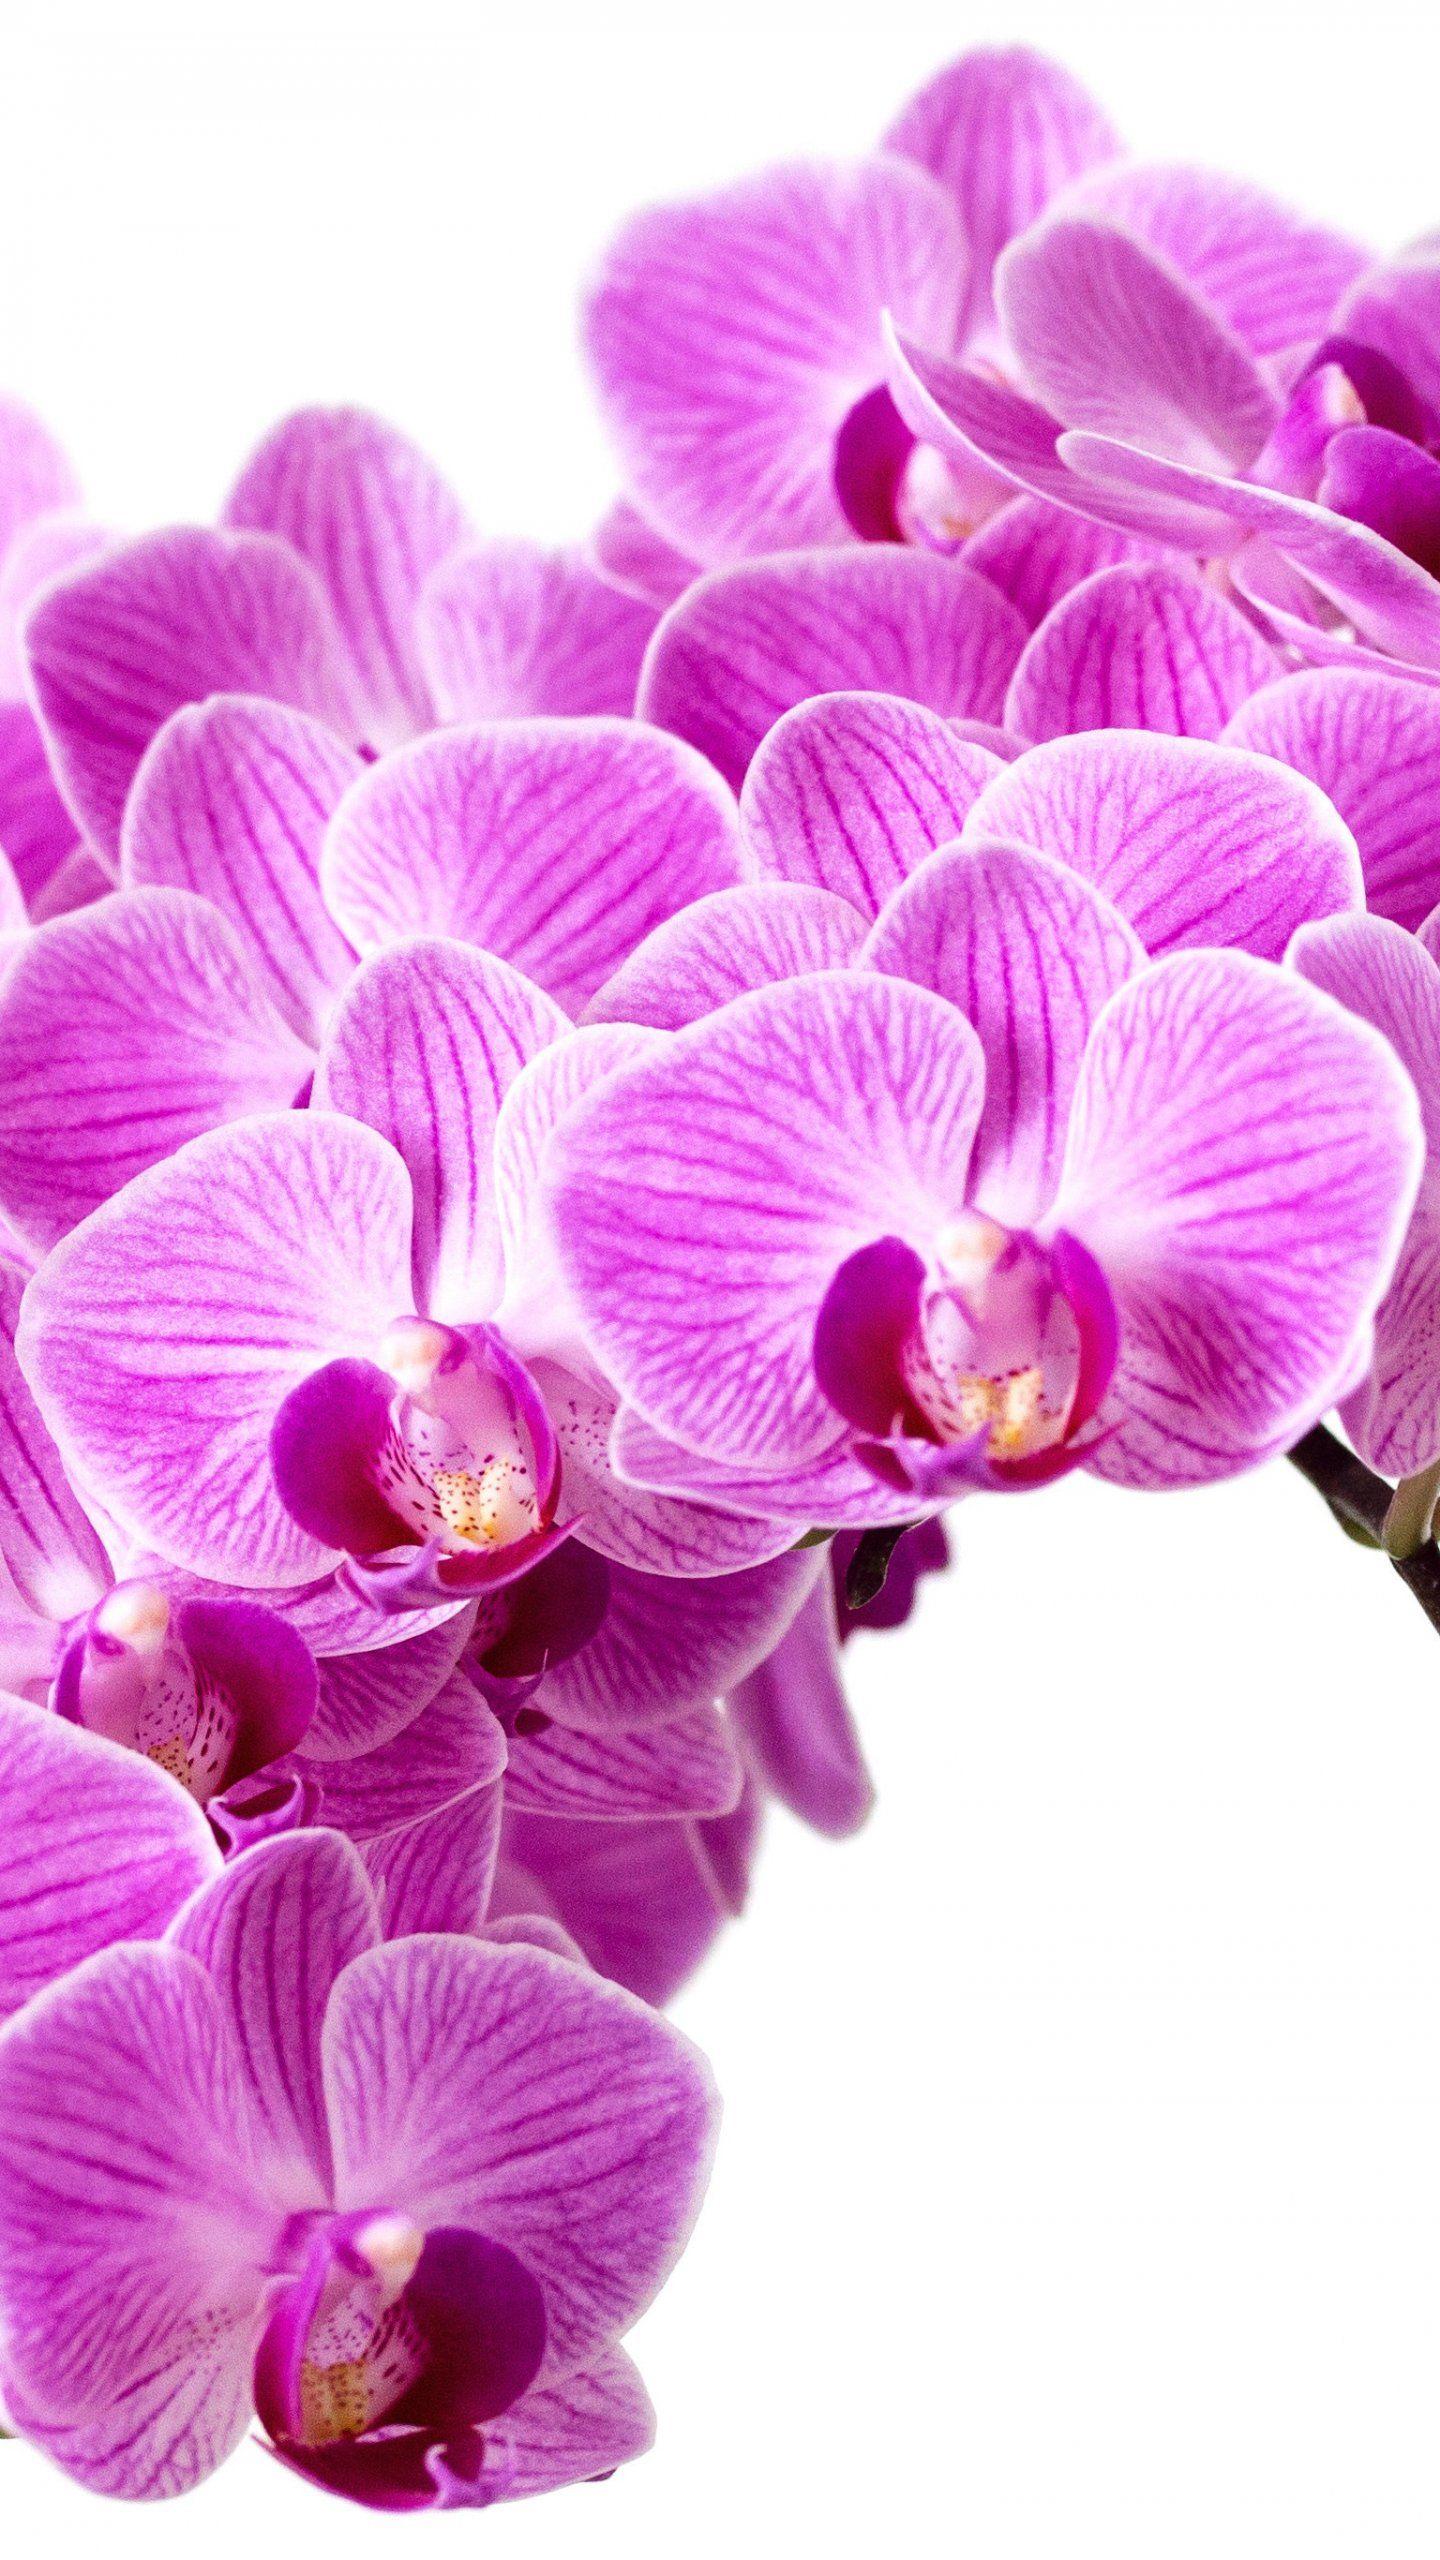 Purple Orchid Wallpaper Iphone Android Desktop Backgrounds Orchid Wallpaper Purple Orchids Flower Wallpaper